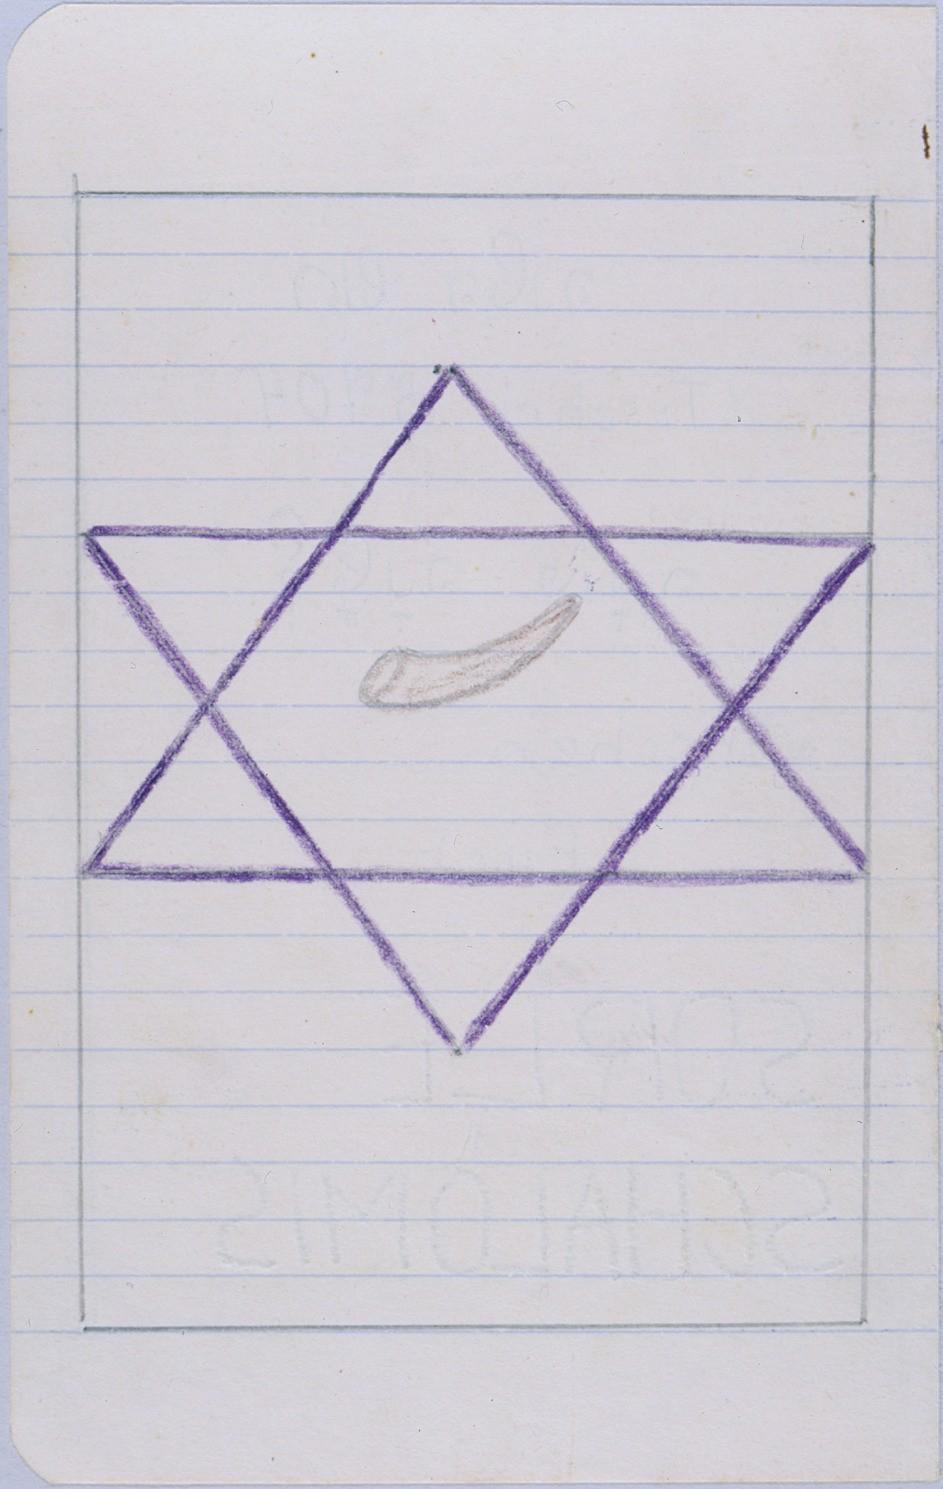 Rosh Hashanah card [LCID: 2002a9df]